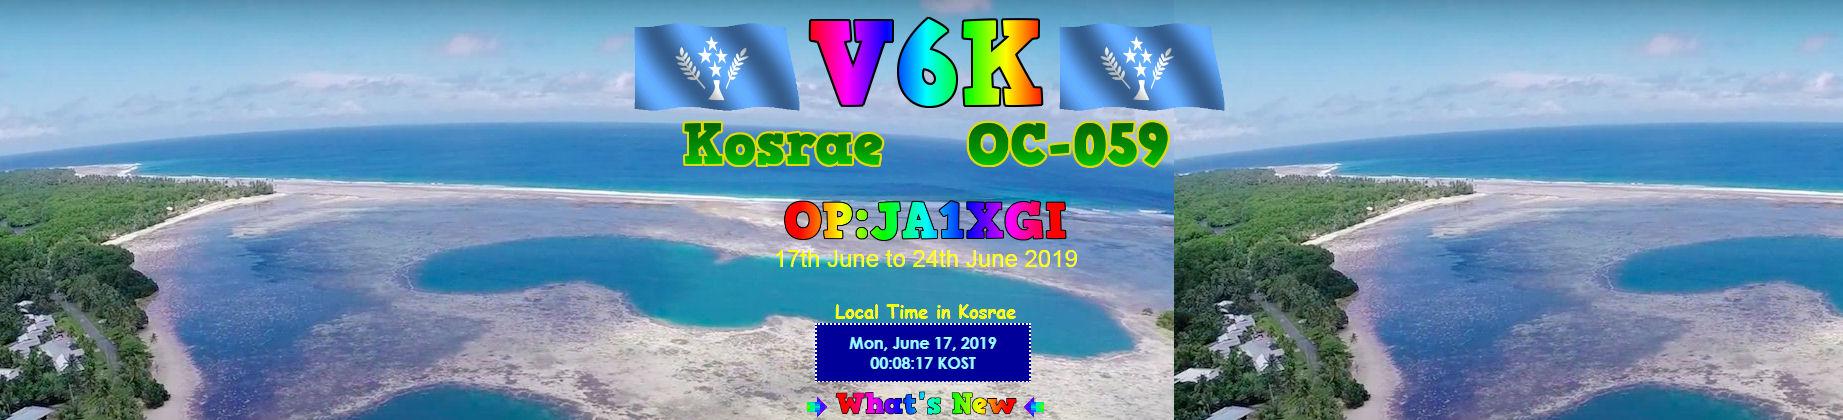 V6K Kosrae Island attivo in FT8